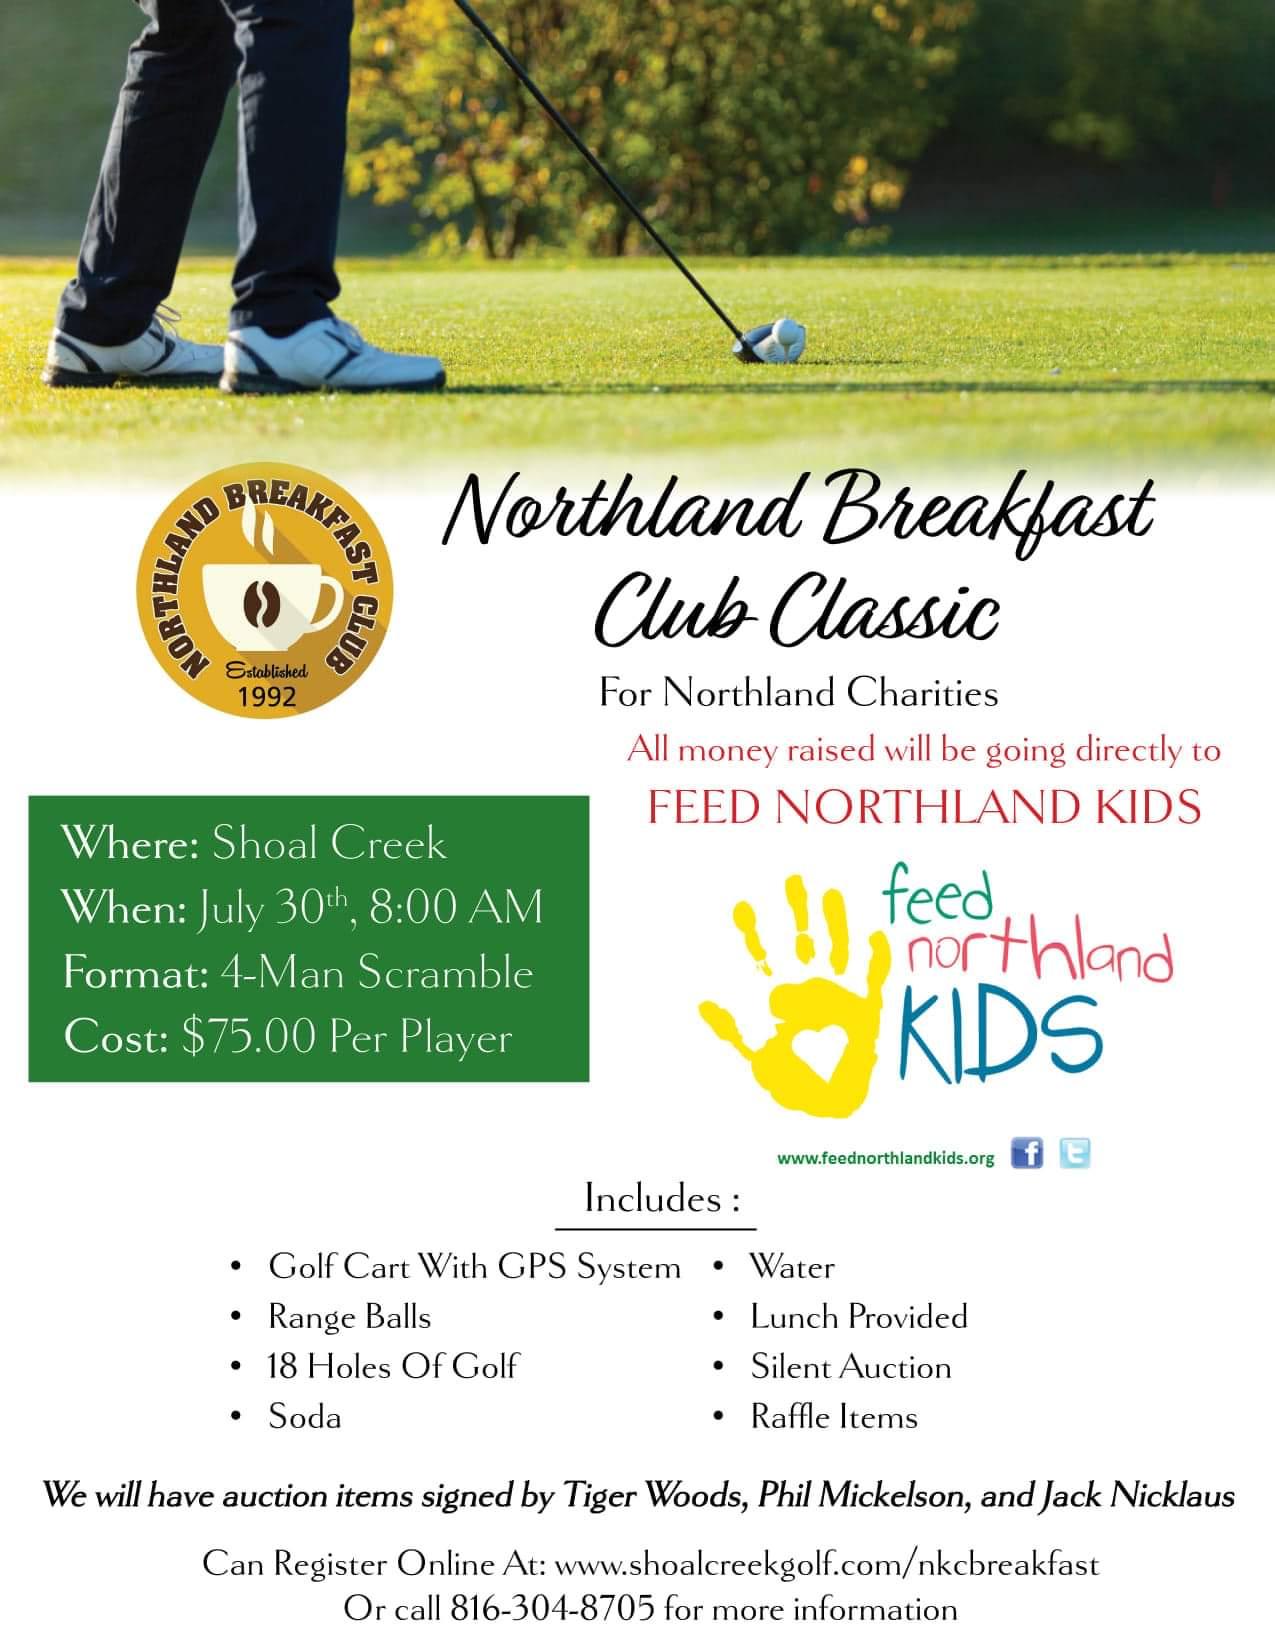 Northland Breakfast Club Classic